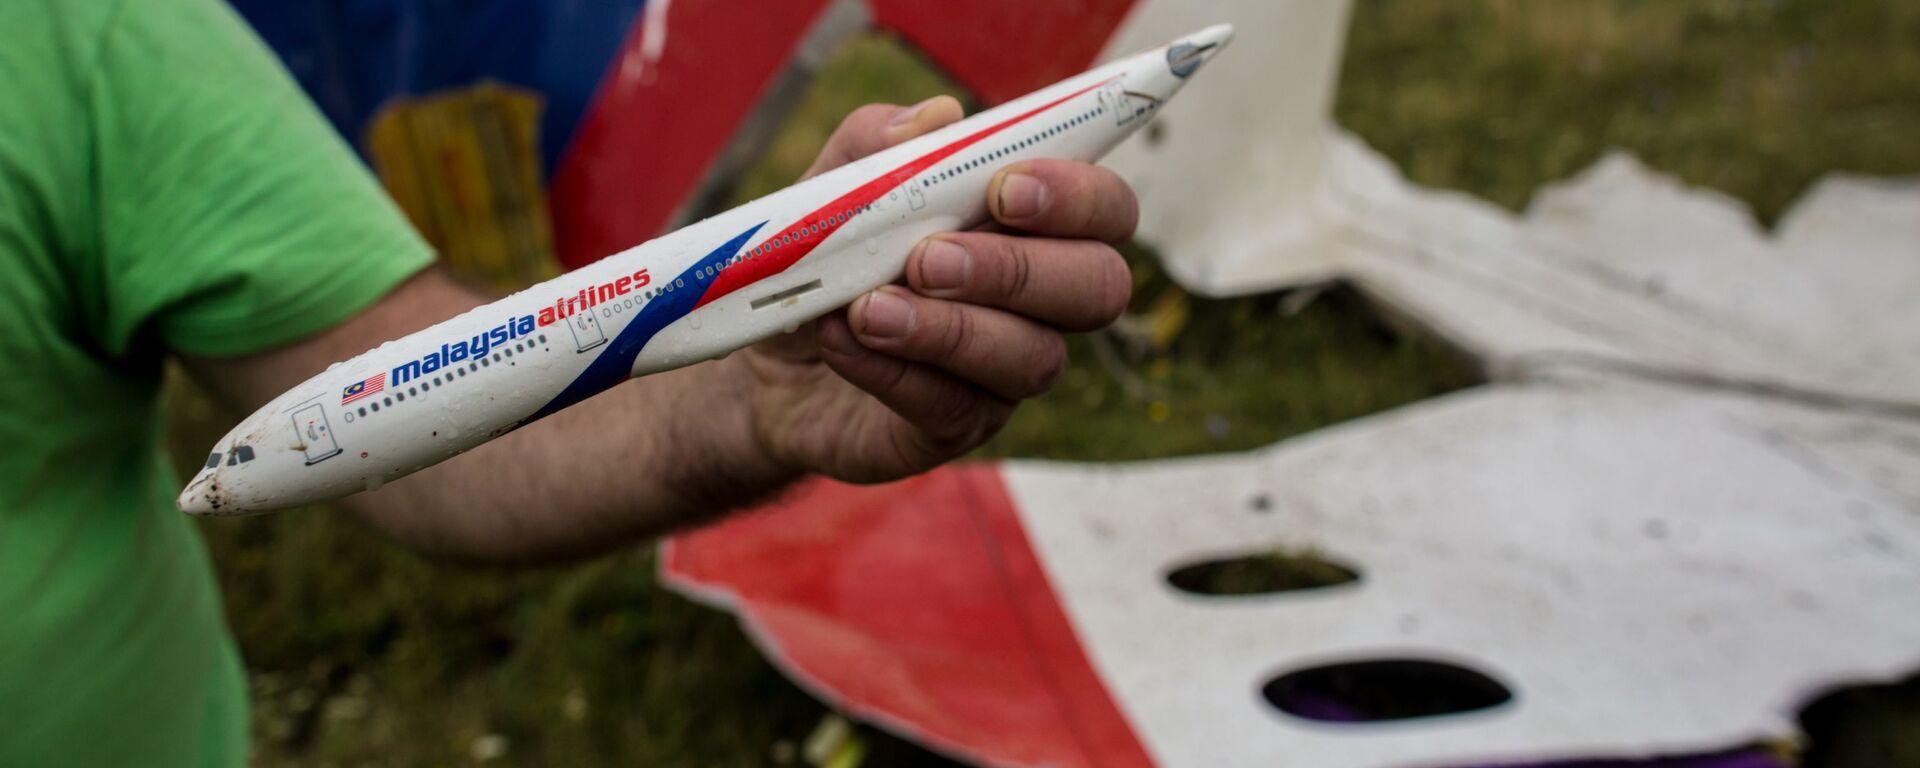 Katastrofa Boeinga 777 nad Donbasem - Sputnik Polska, 1920, 09.06.2021